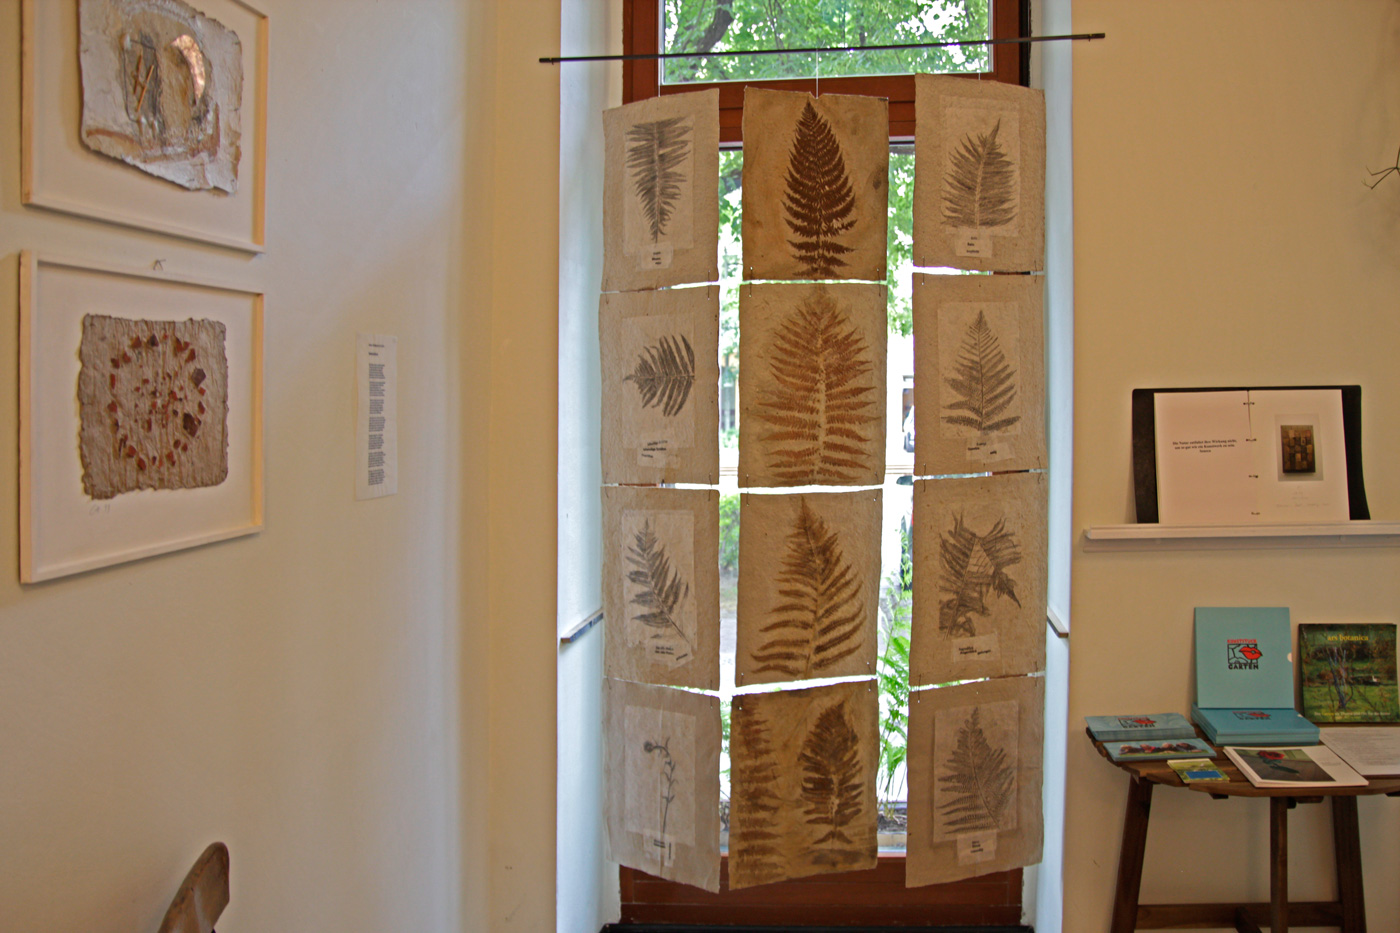 Einzelausstellung - Galerie Hortus Conclusus